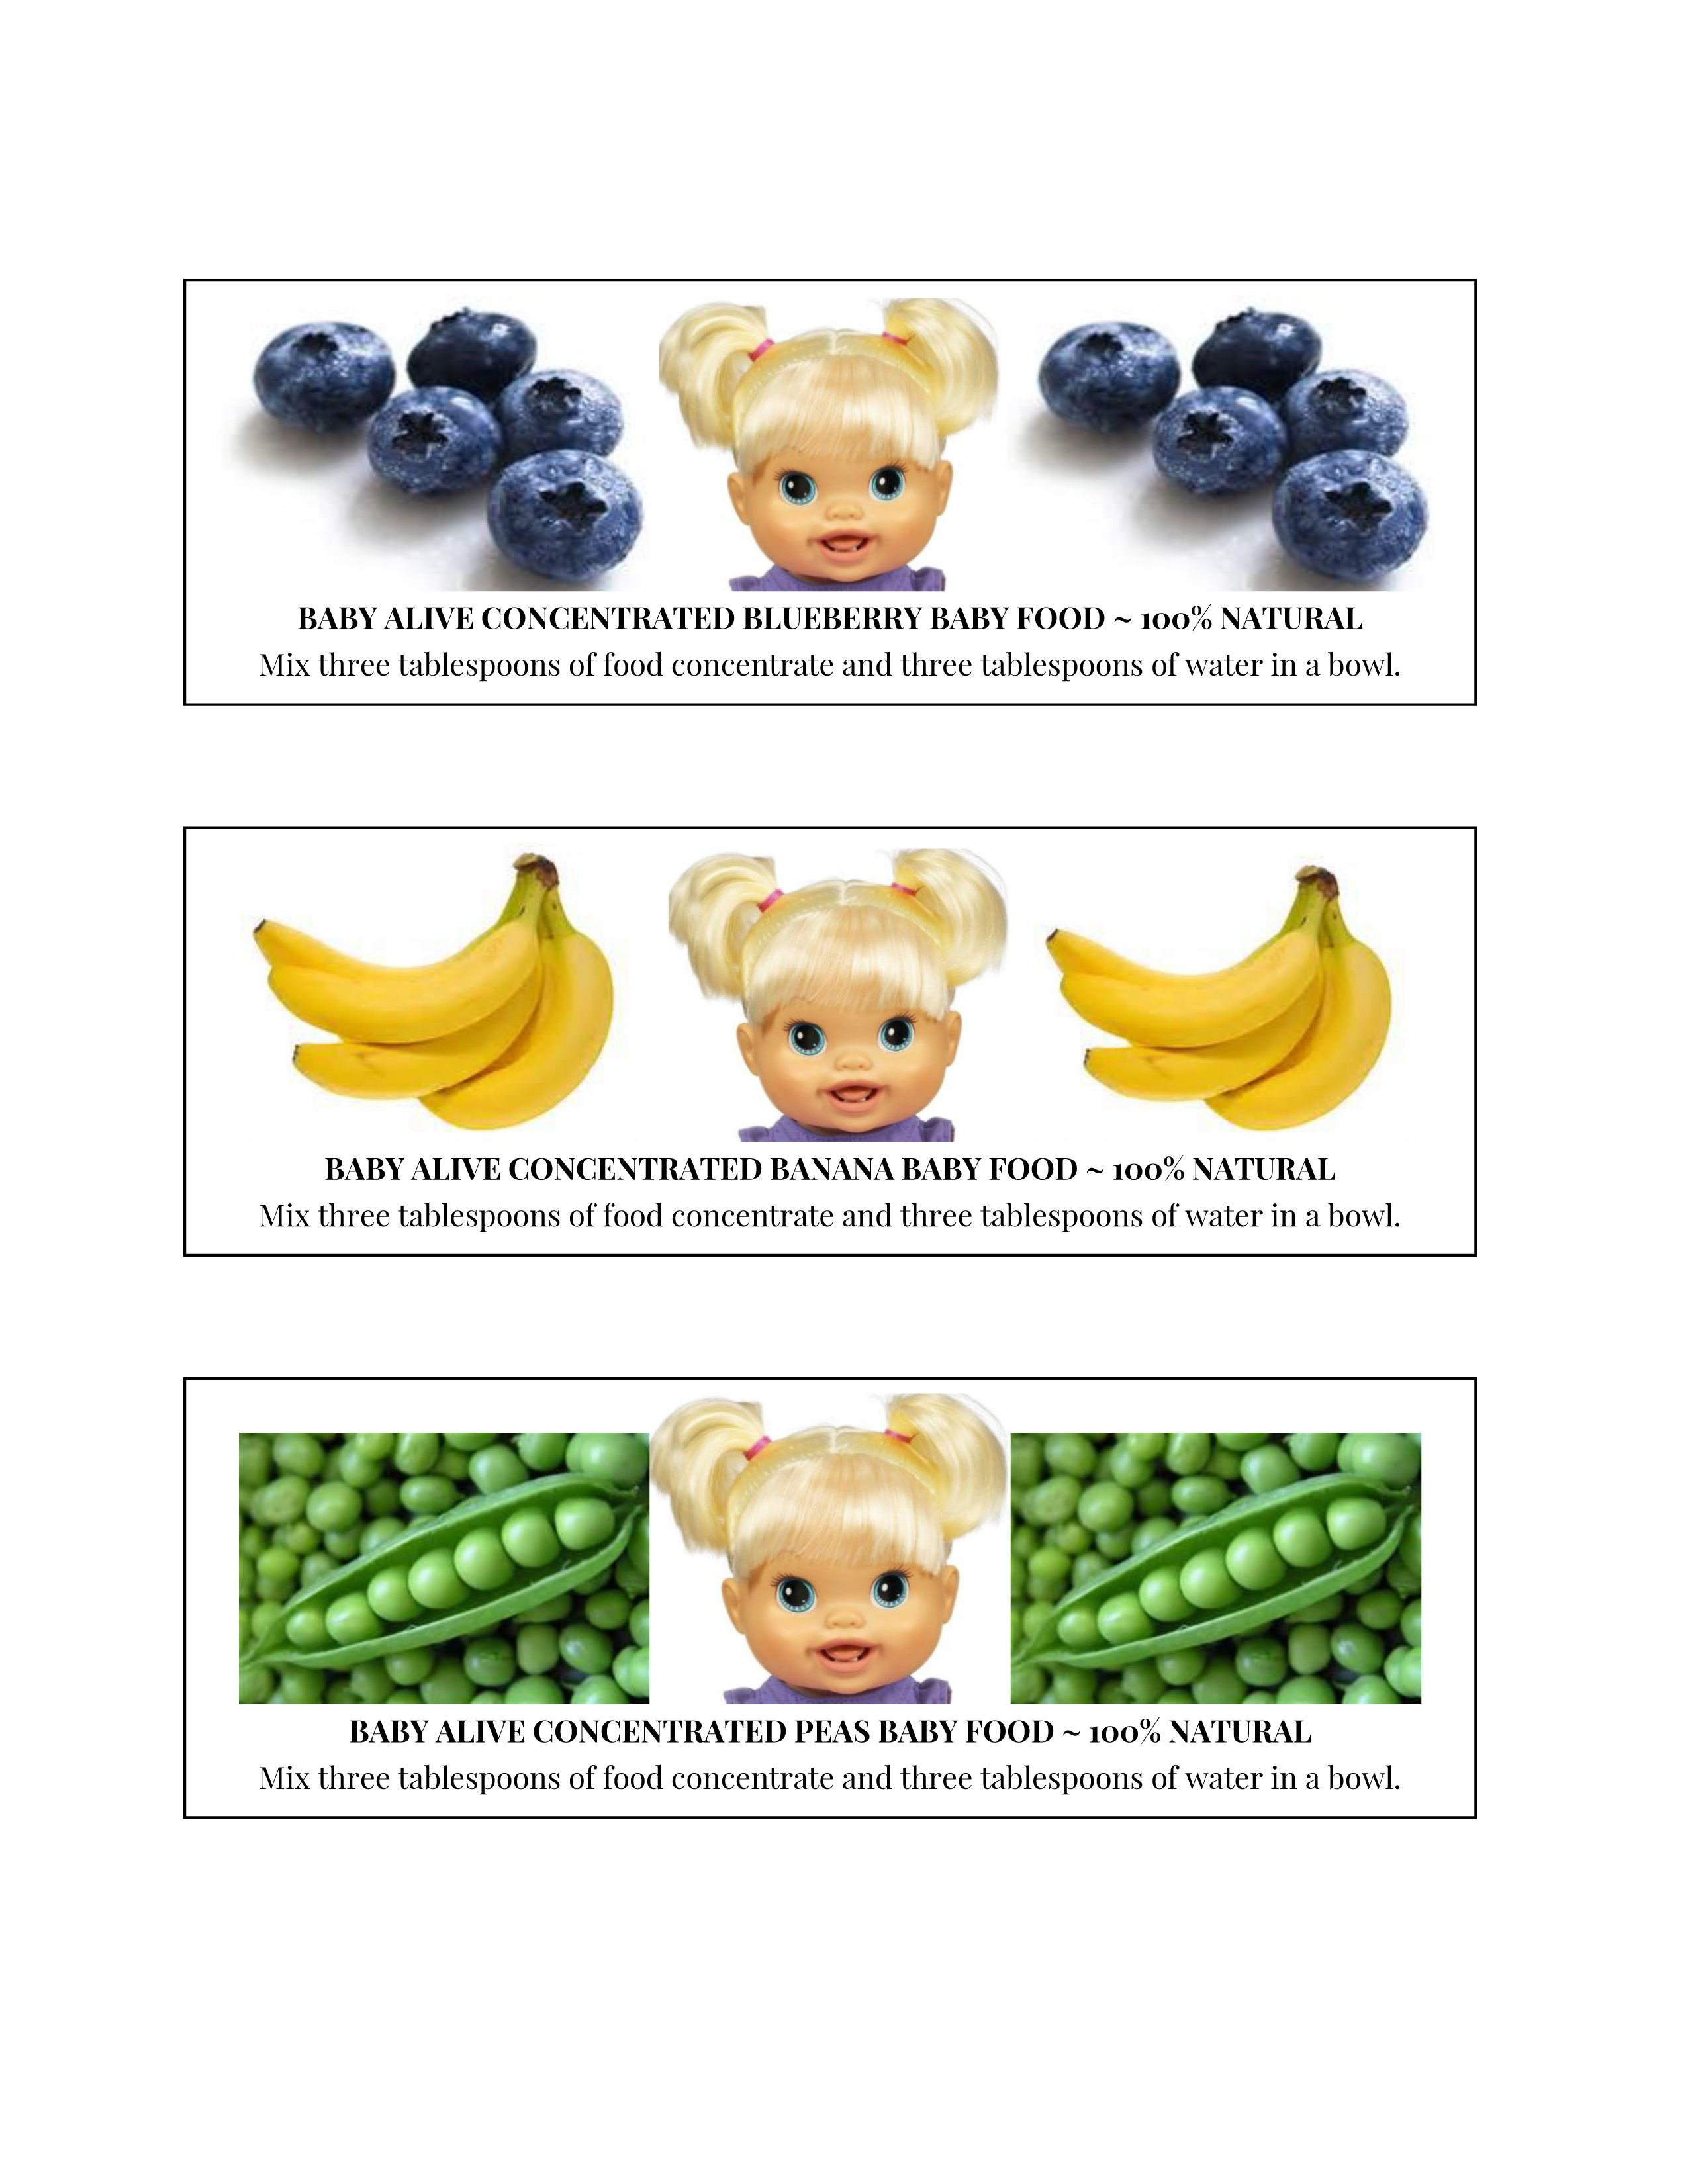 Diy Labels For Homemade Baby Alive Food Glue Or Tape To Baby Food Jars Baby Alive Food Baby Alive Baby Food Jars